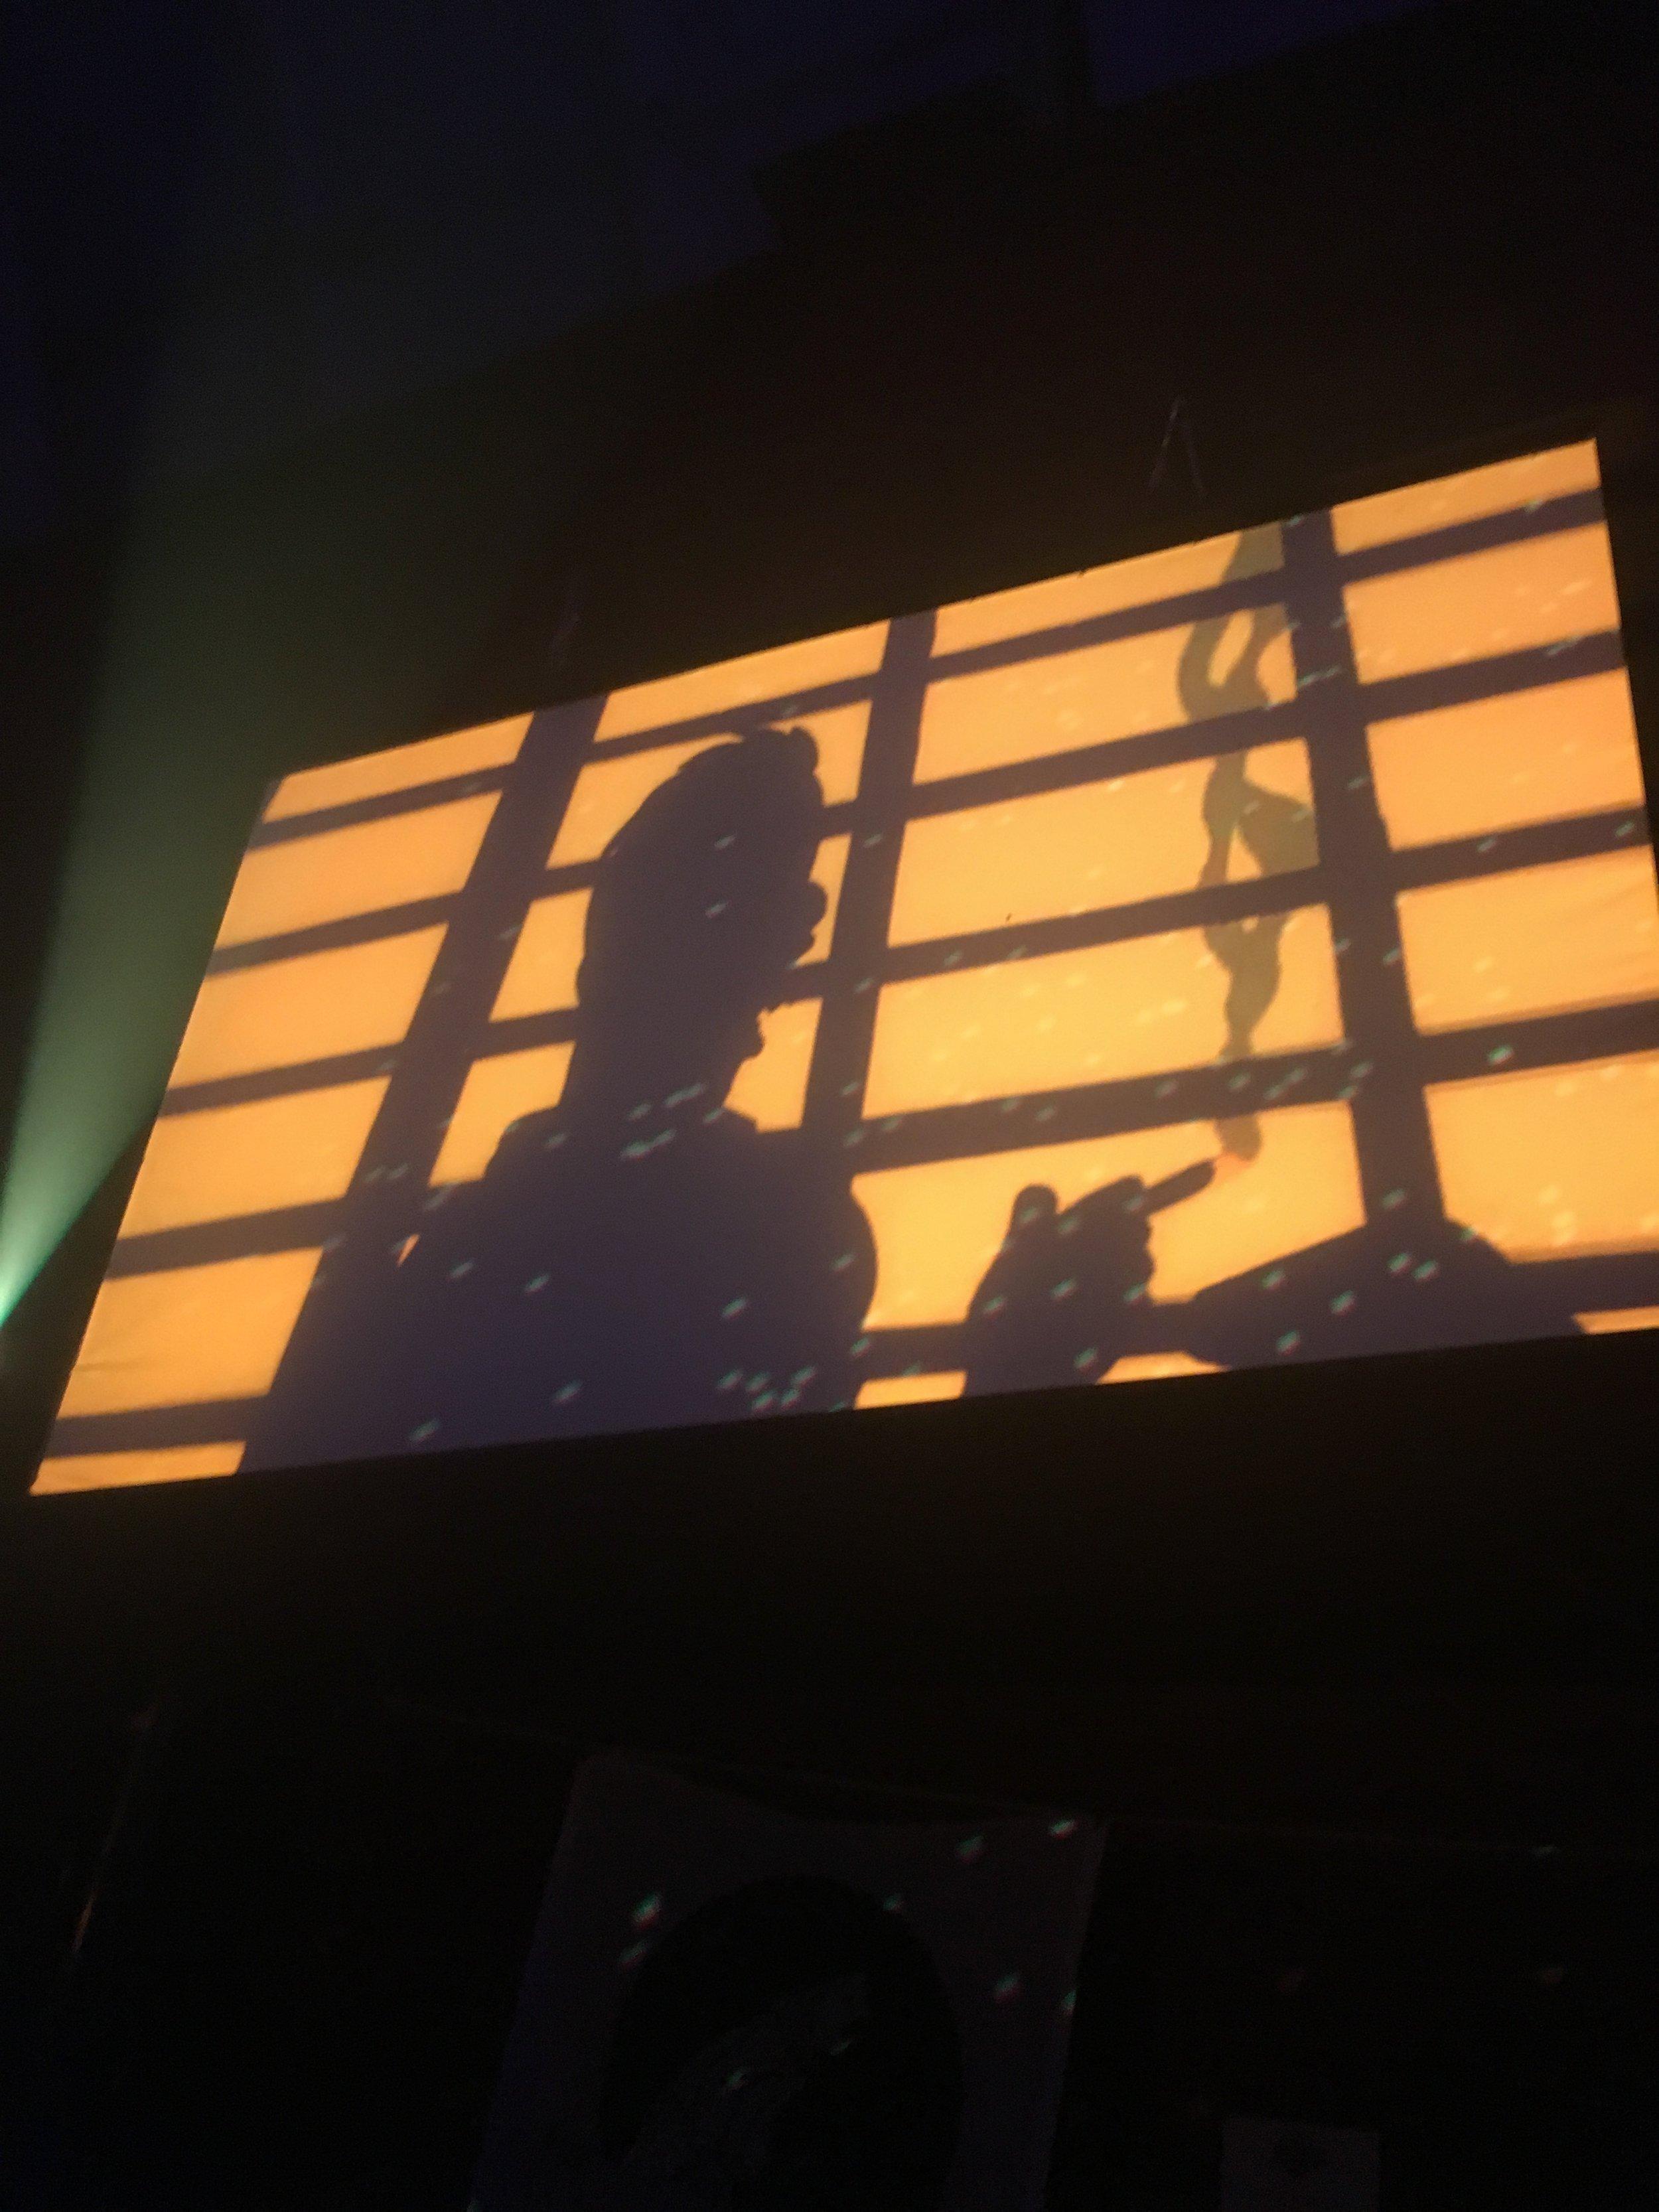 Tintin visuals play on the big screen, Photo: Christina Karras